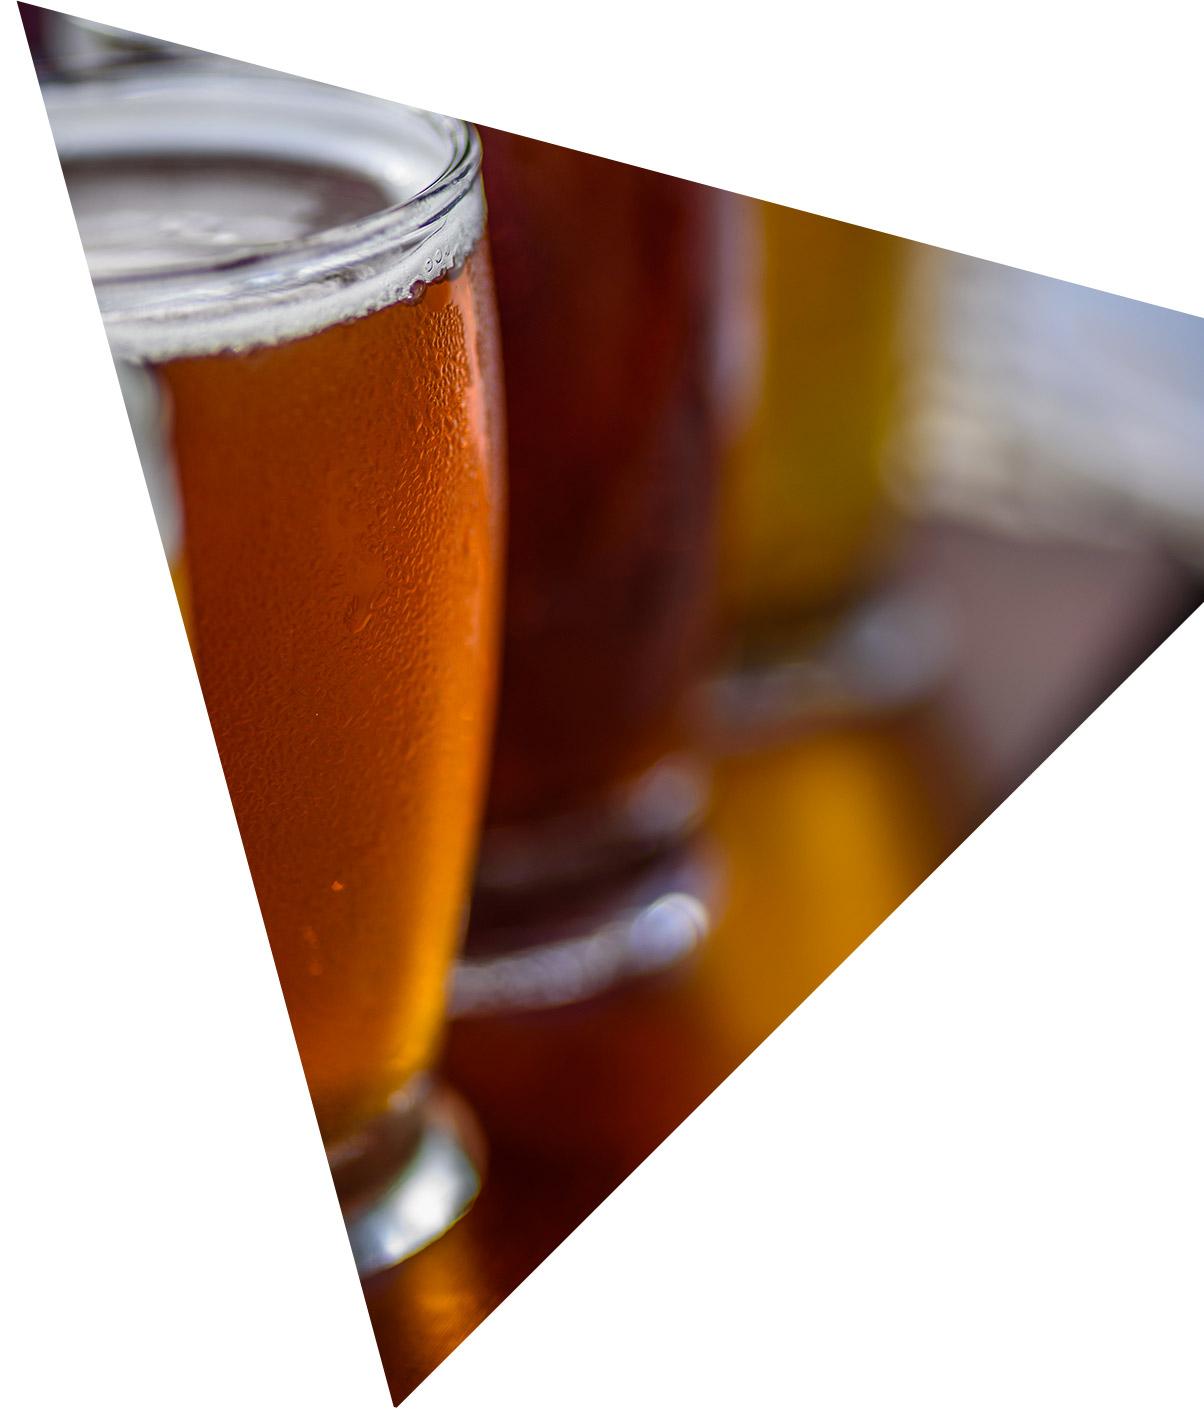 https://www.ricci-eng.com/wp-content/uploads/2021/03/Plants-for-breweries-2021-2.jpg